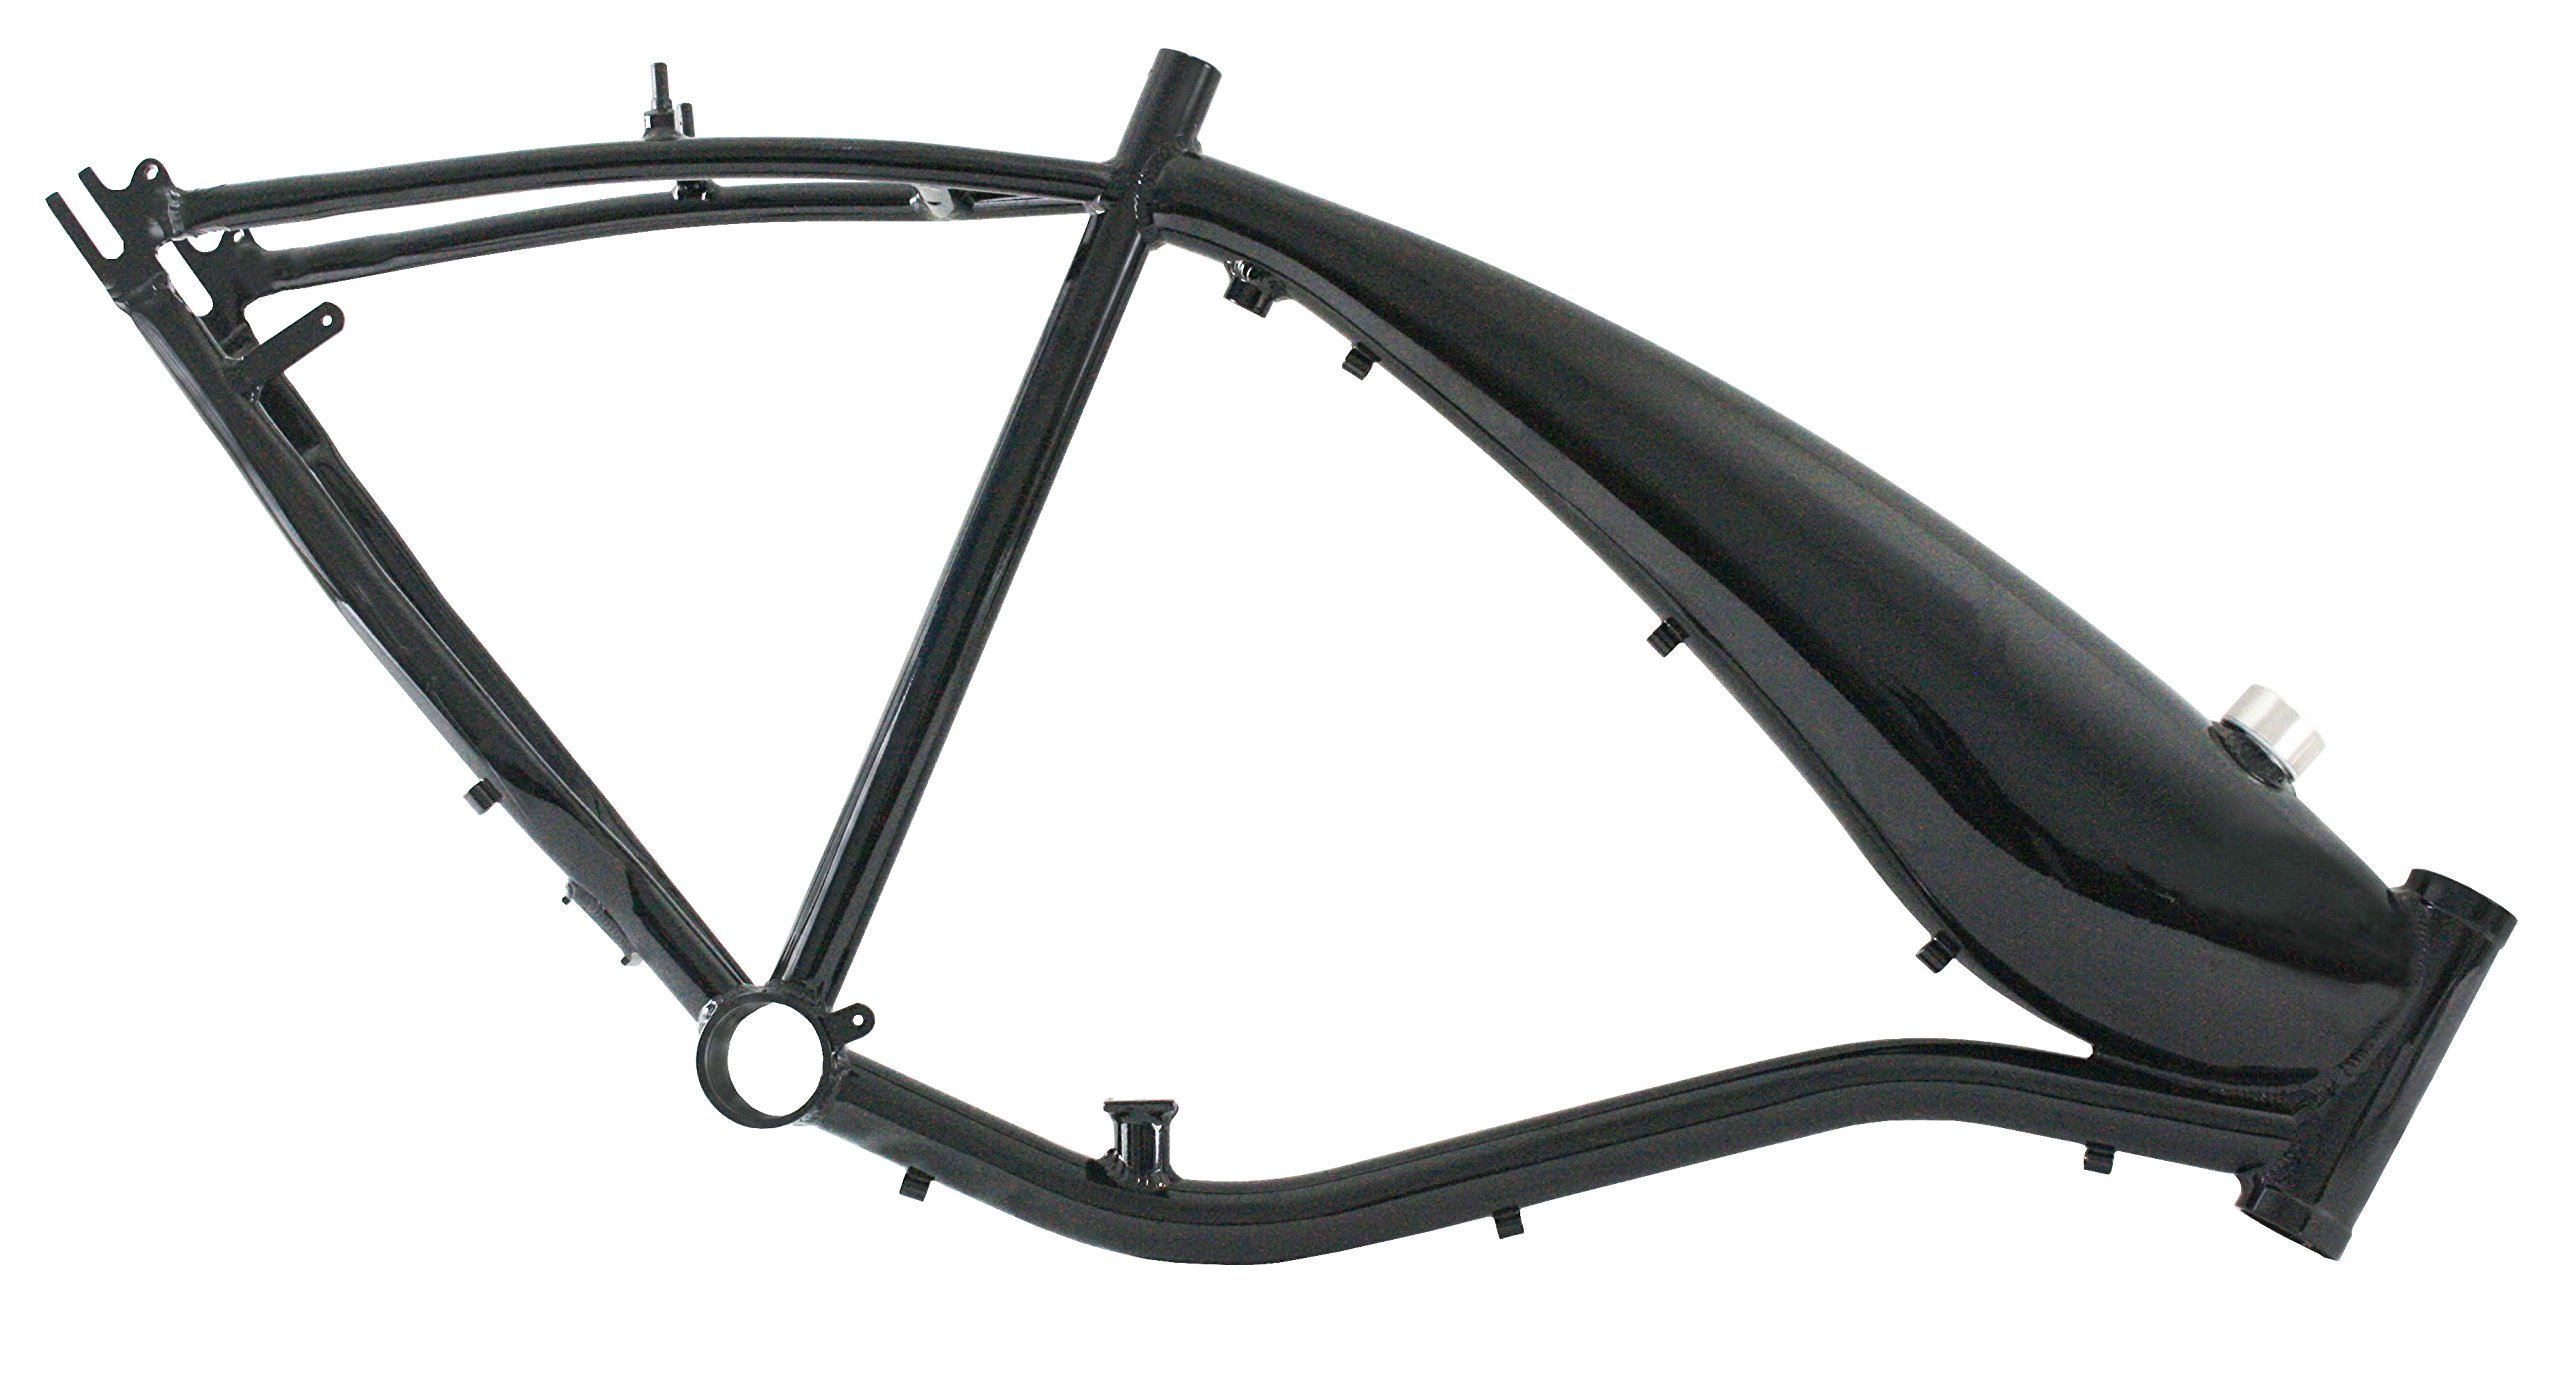 Bicycle Frame w/fuel tank 3.75l - Black by Kobe (Image #2)